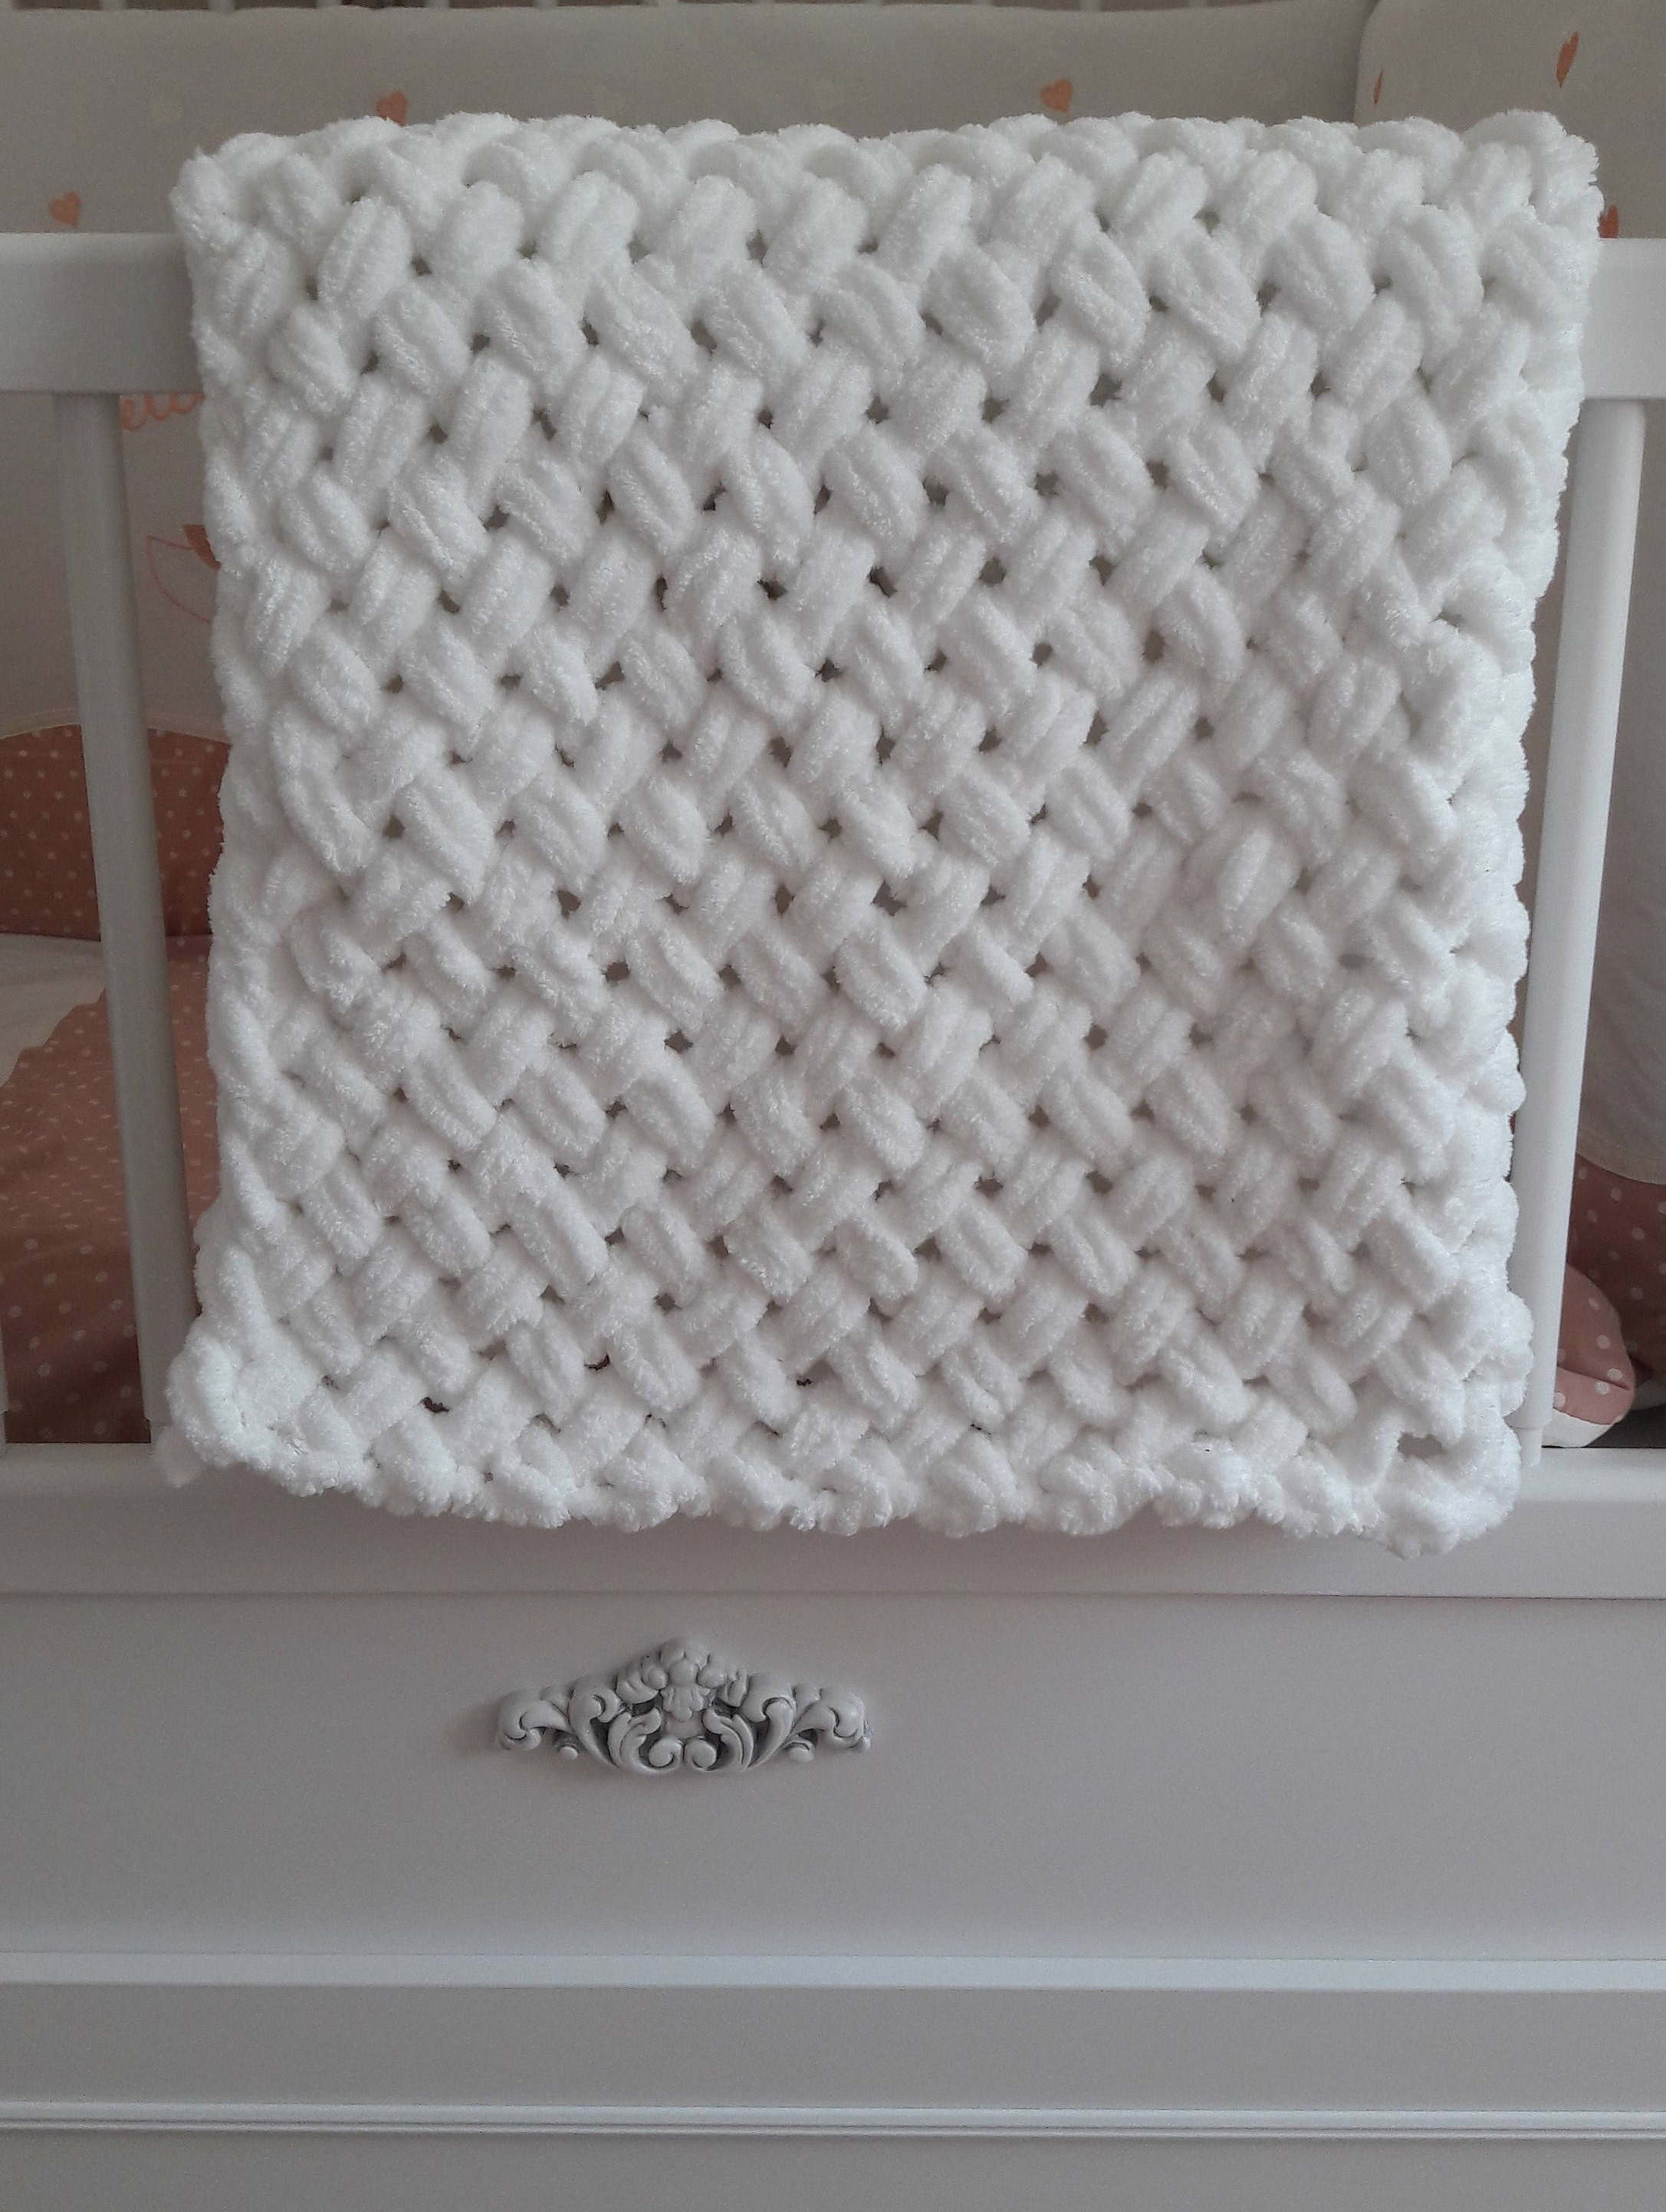 Alize Puffy Velvet Hand Knit Baby Blanket Etsy